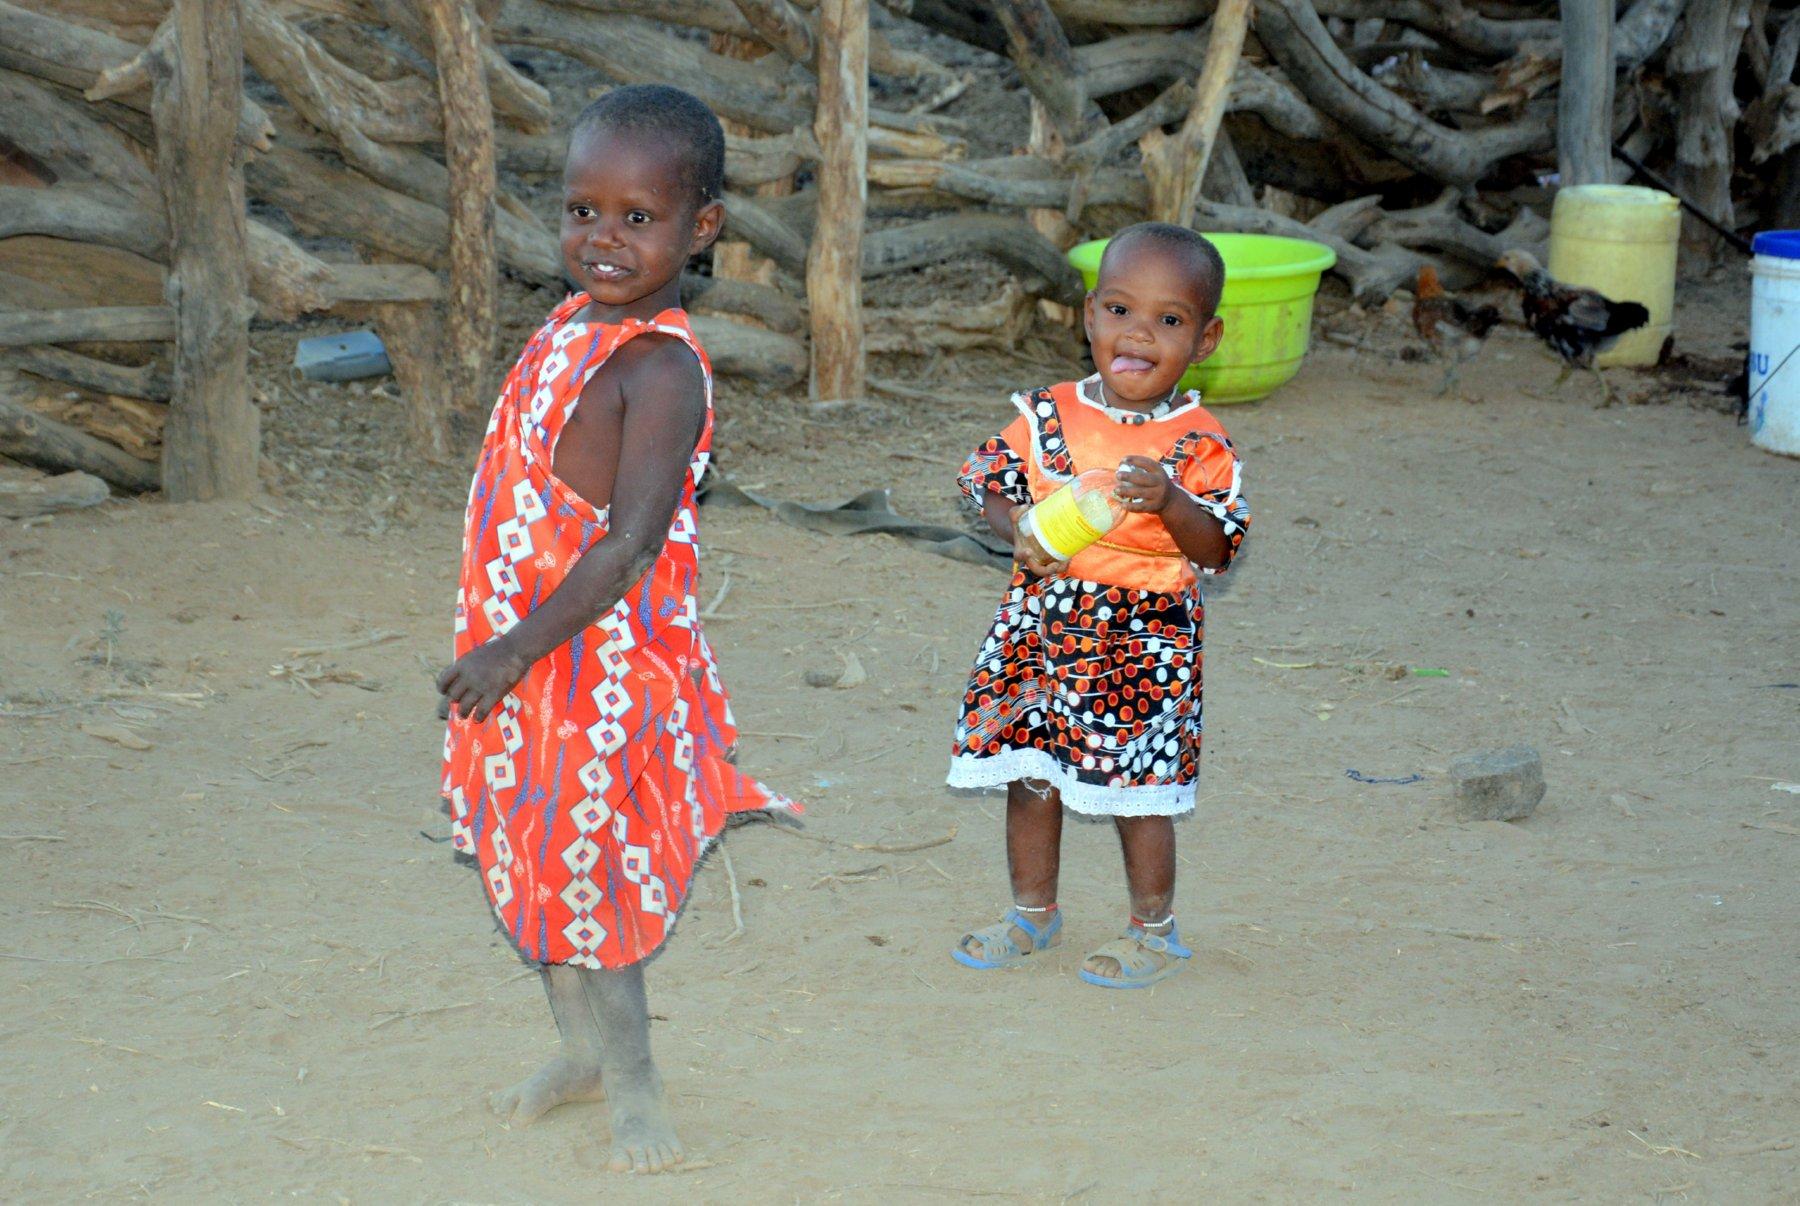 Two beautiful young Maasai girls (Photo: Shasta Bray)